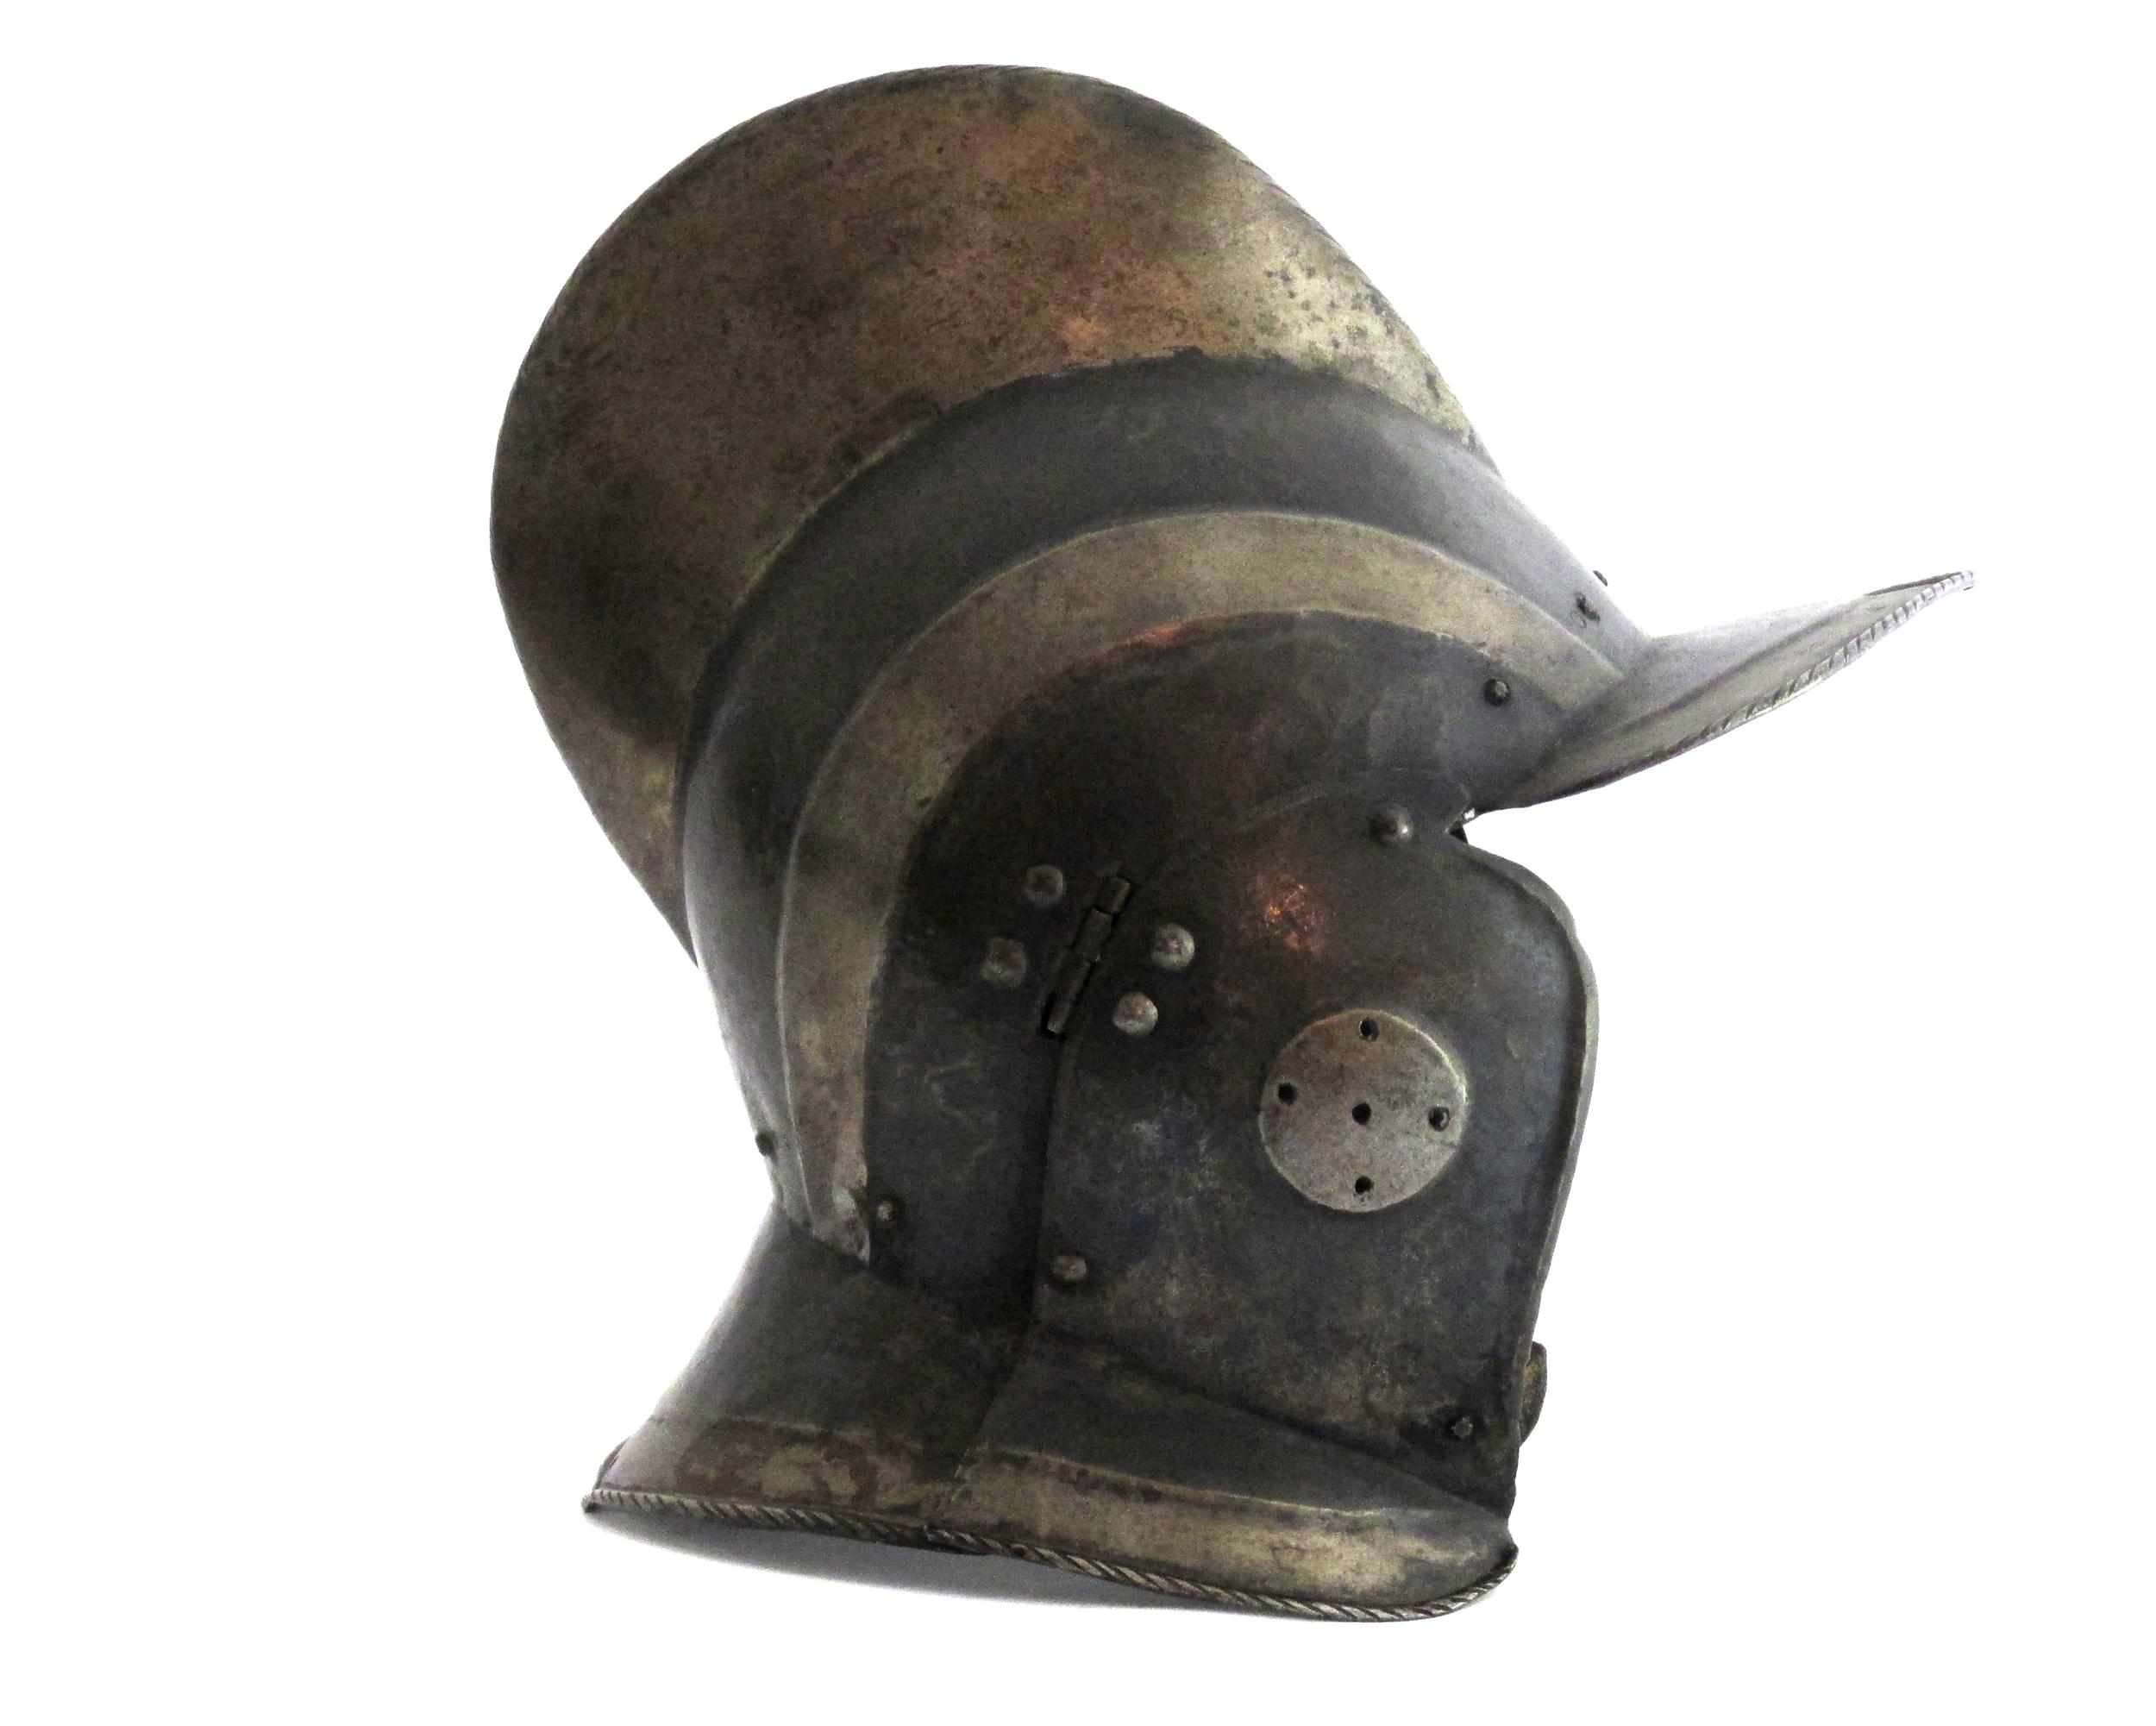 german-black-white-burgonet-helmet-16th-century-gary-friedland-arms-armor.jpg